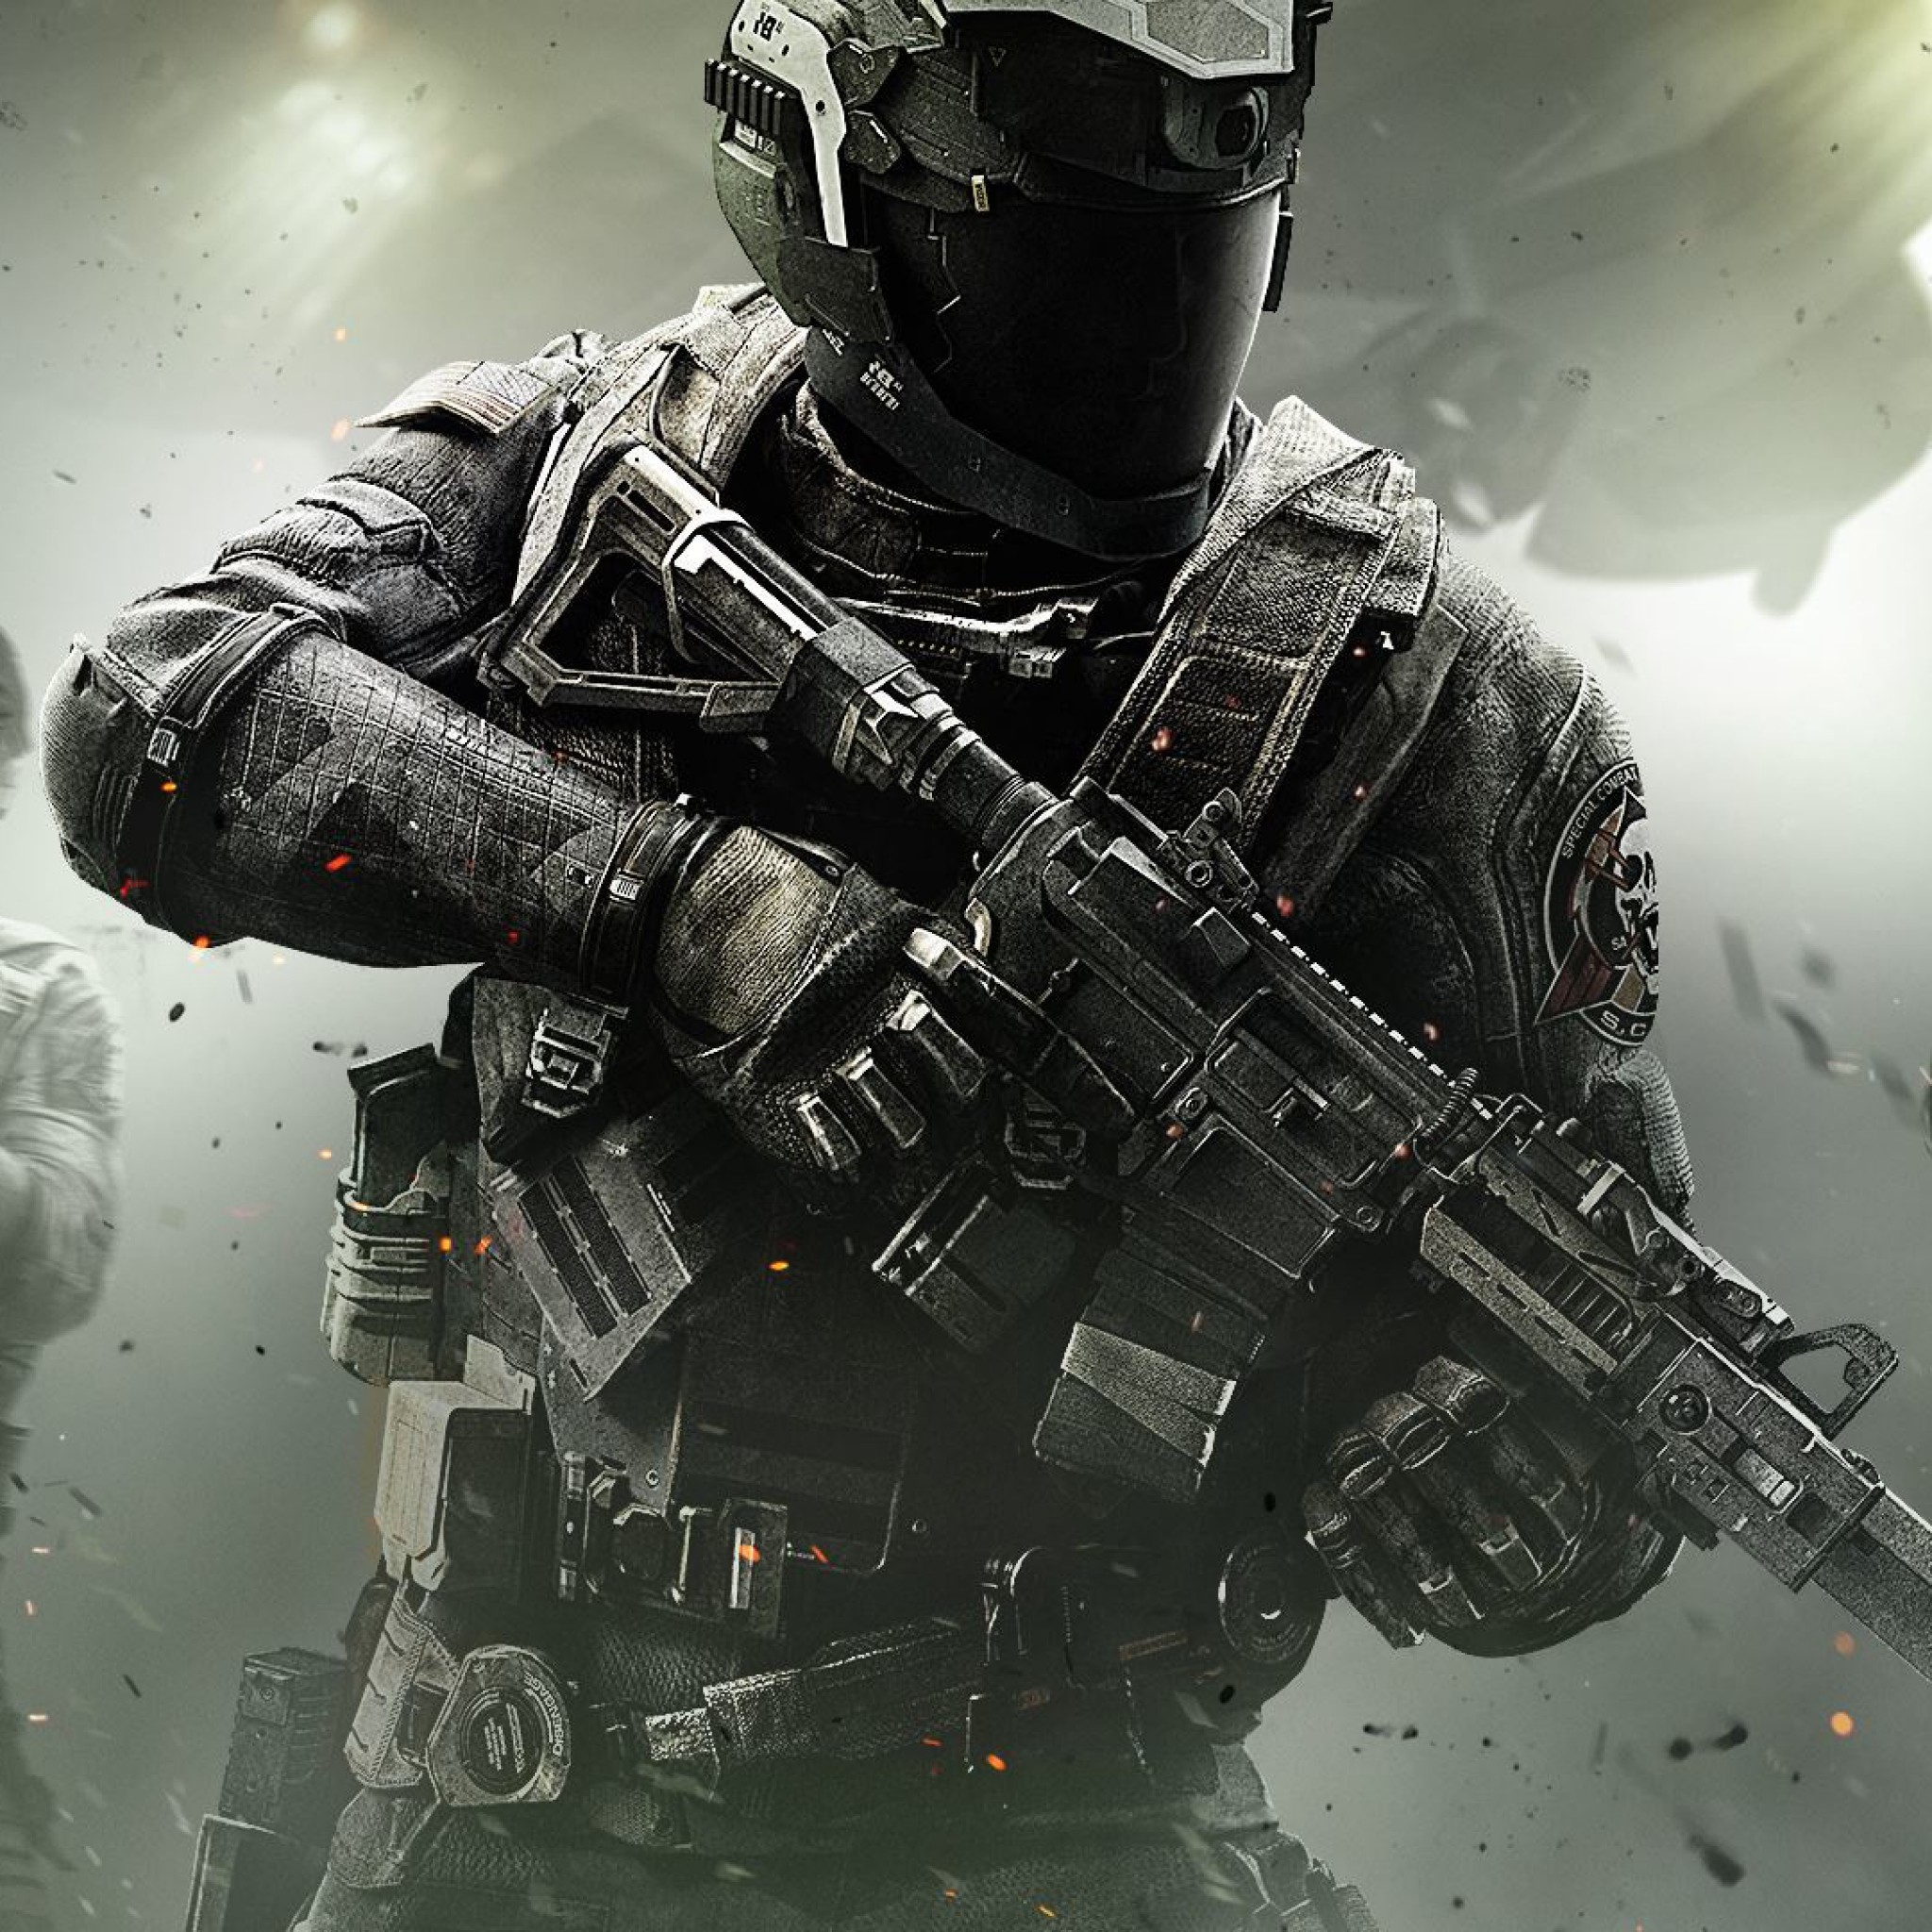 Preview wallpaper call of duty, infinite warfare, infinity ward 2048×2048